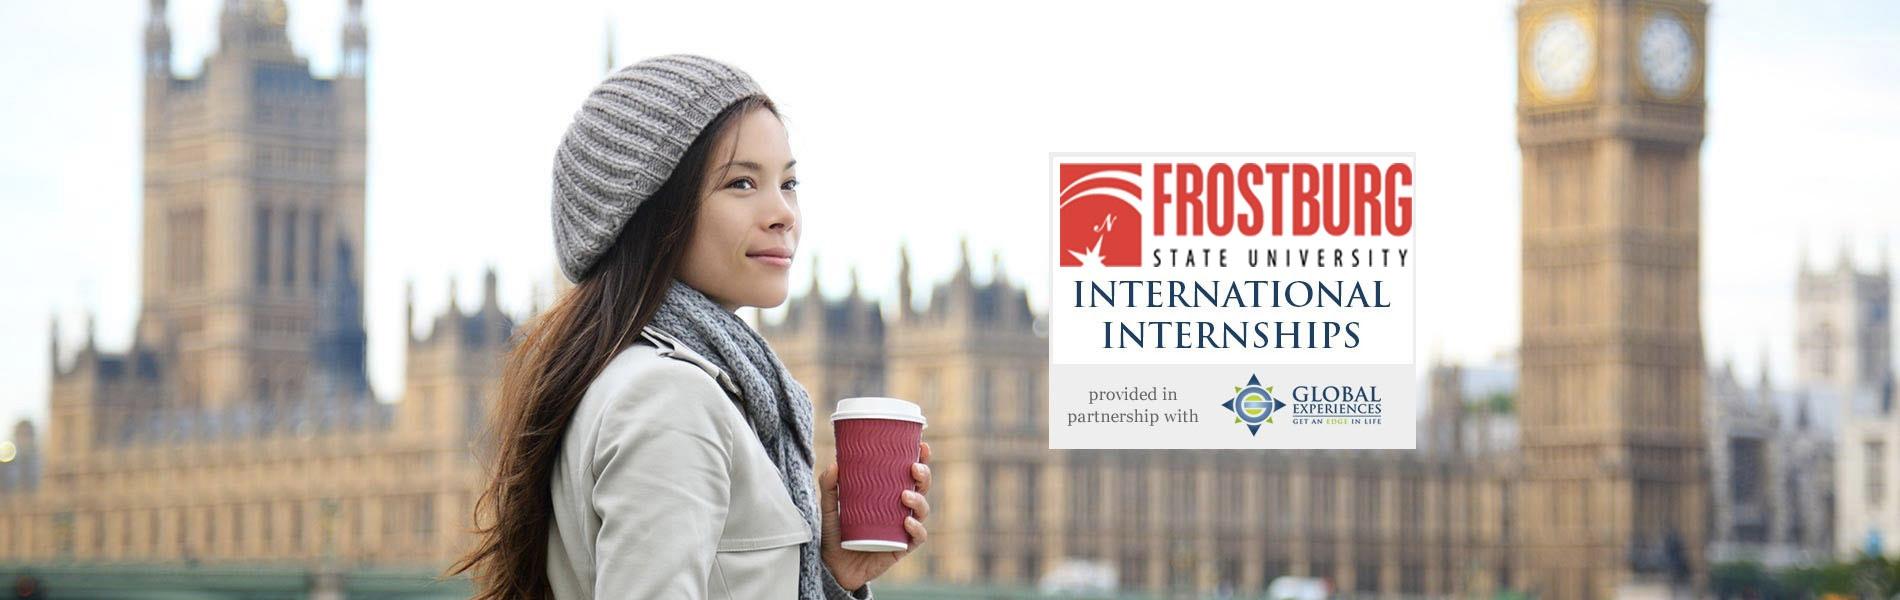 frostburg intern abroad